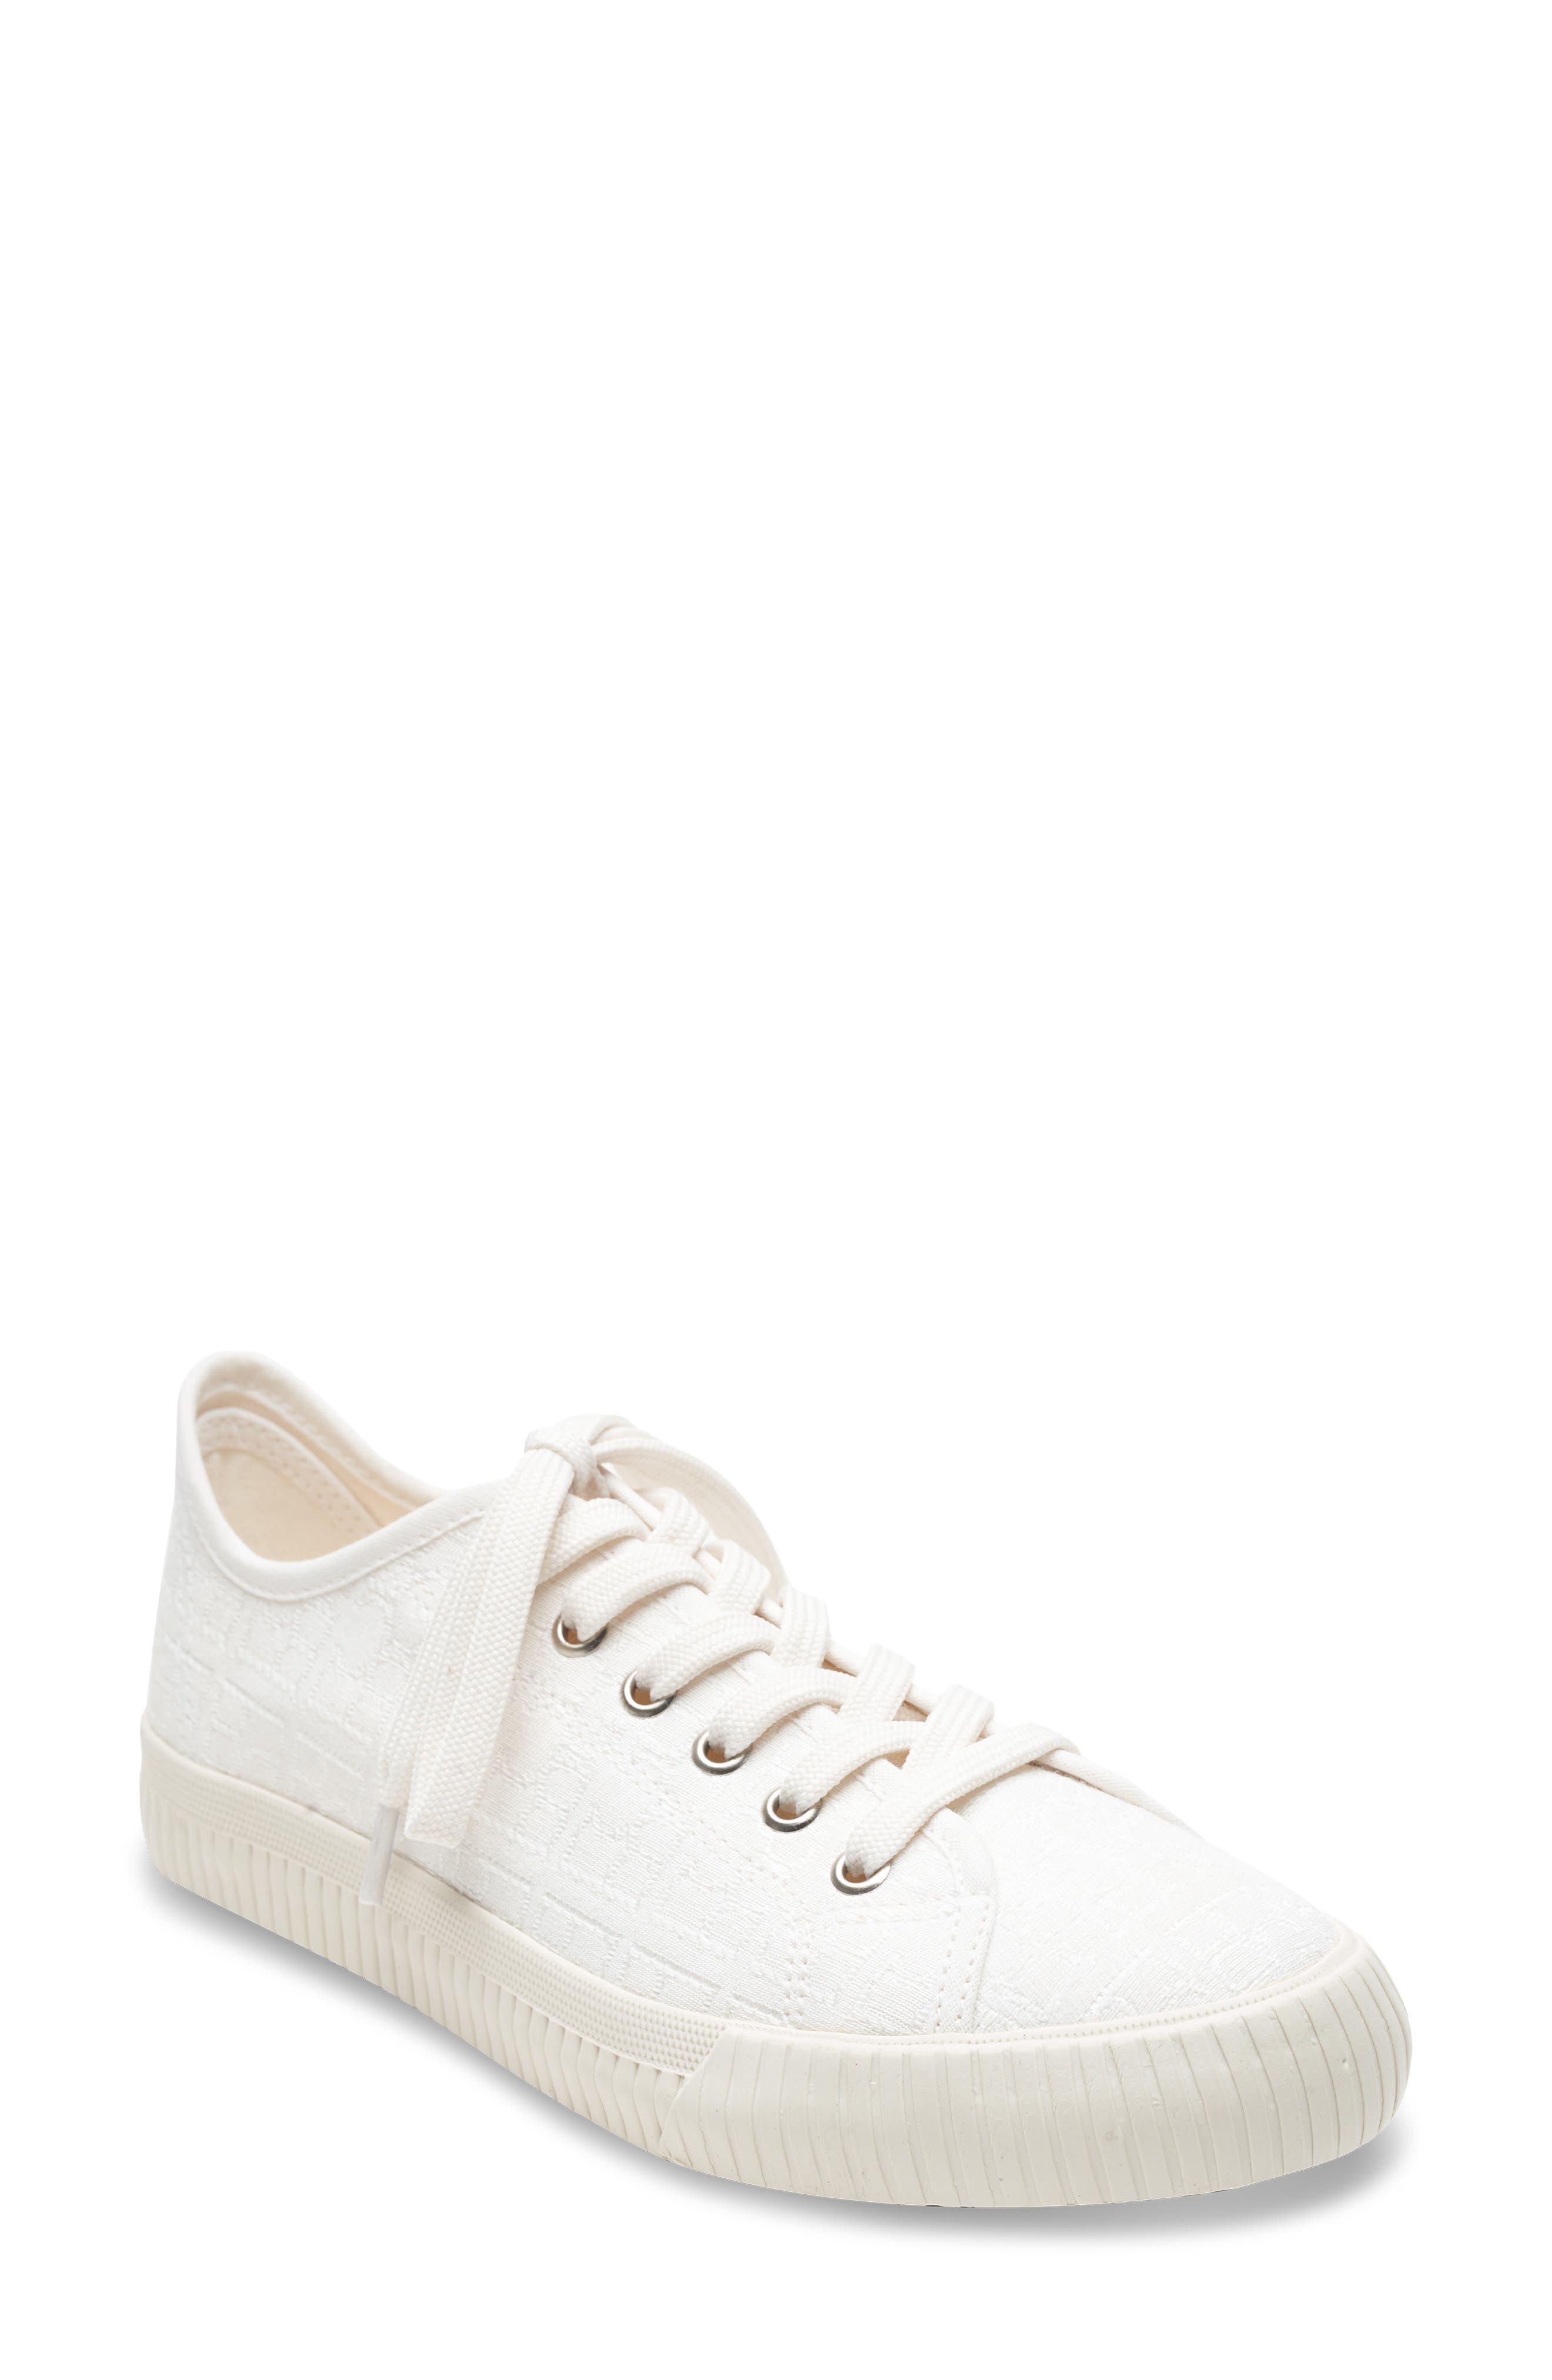 Harly Platform Sneaker